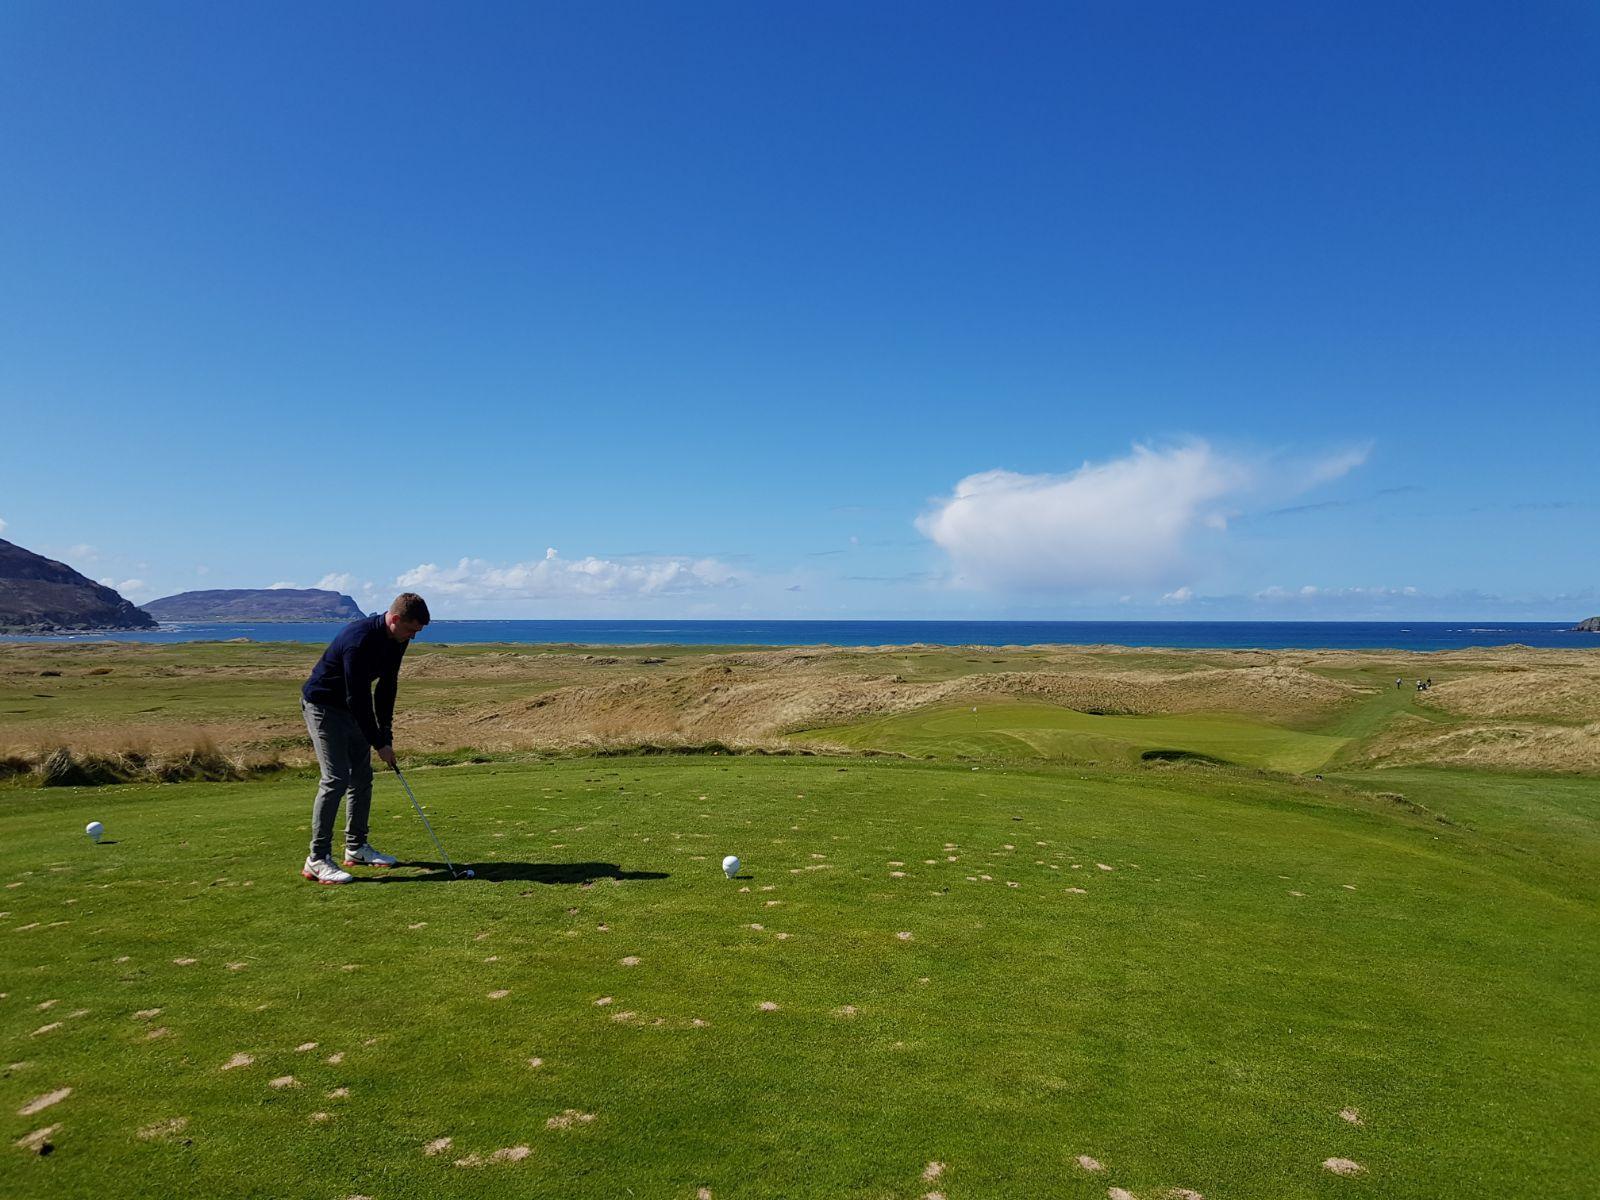 I took on Ballyliffin, host to this year's Irish Open